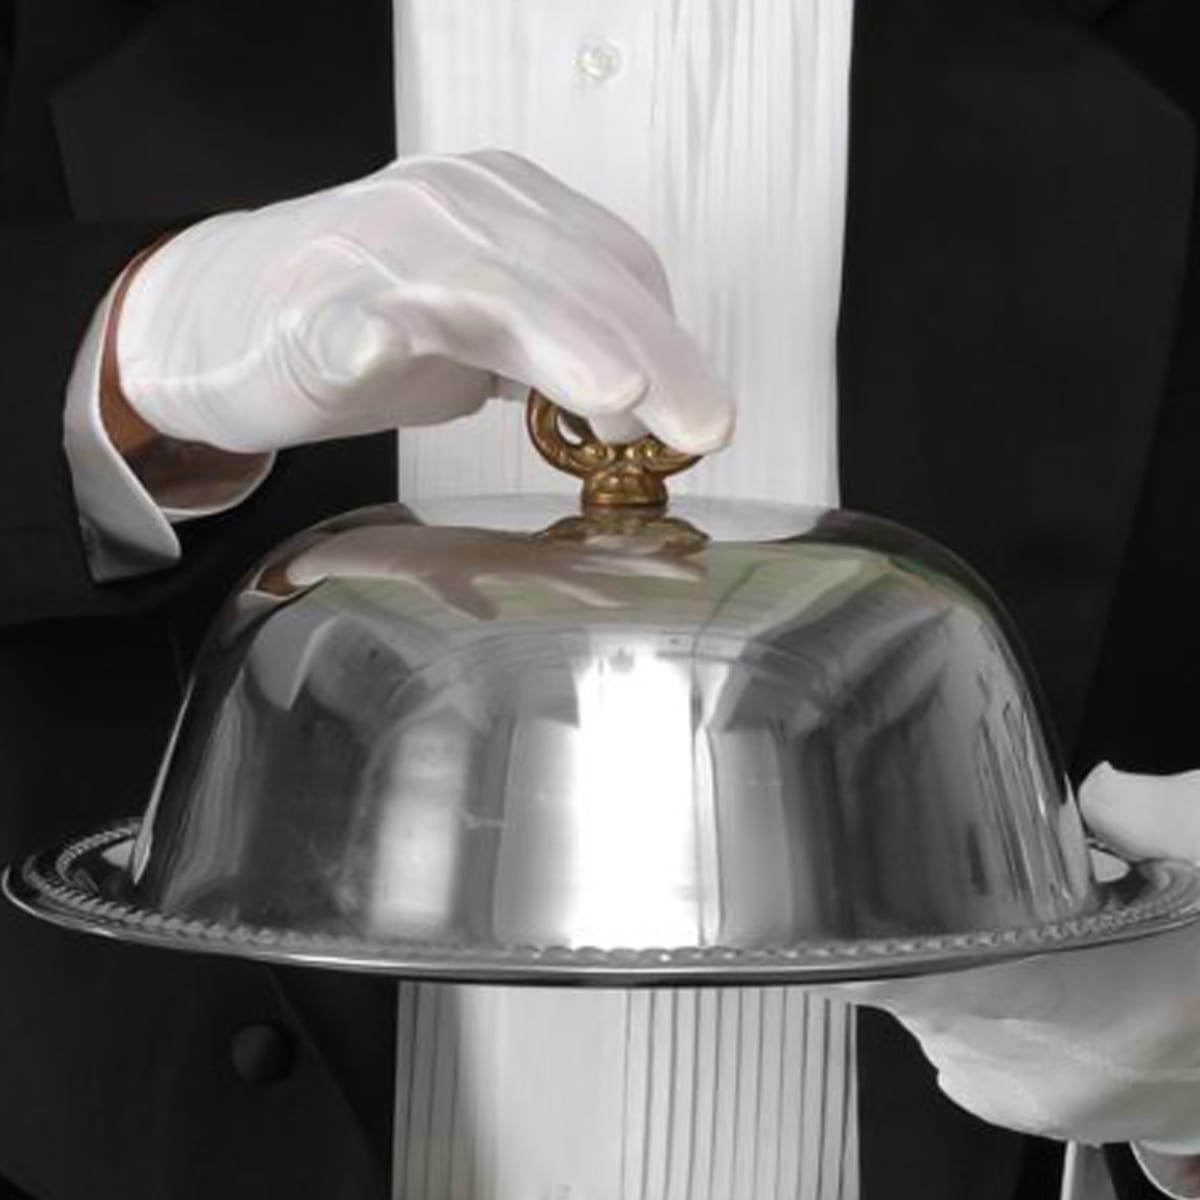 dome waiter white gloves